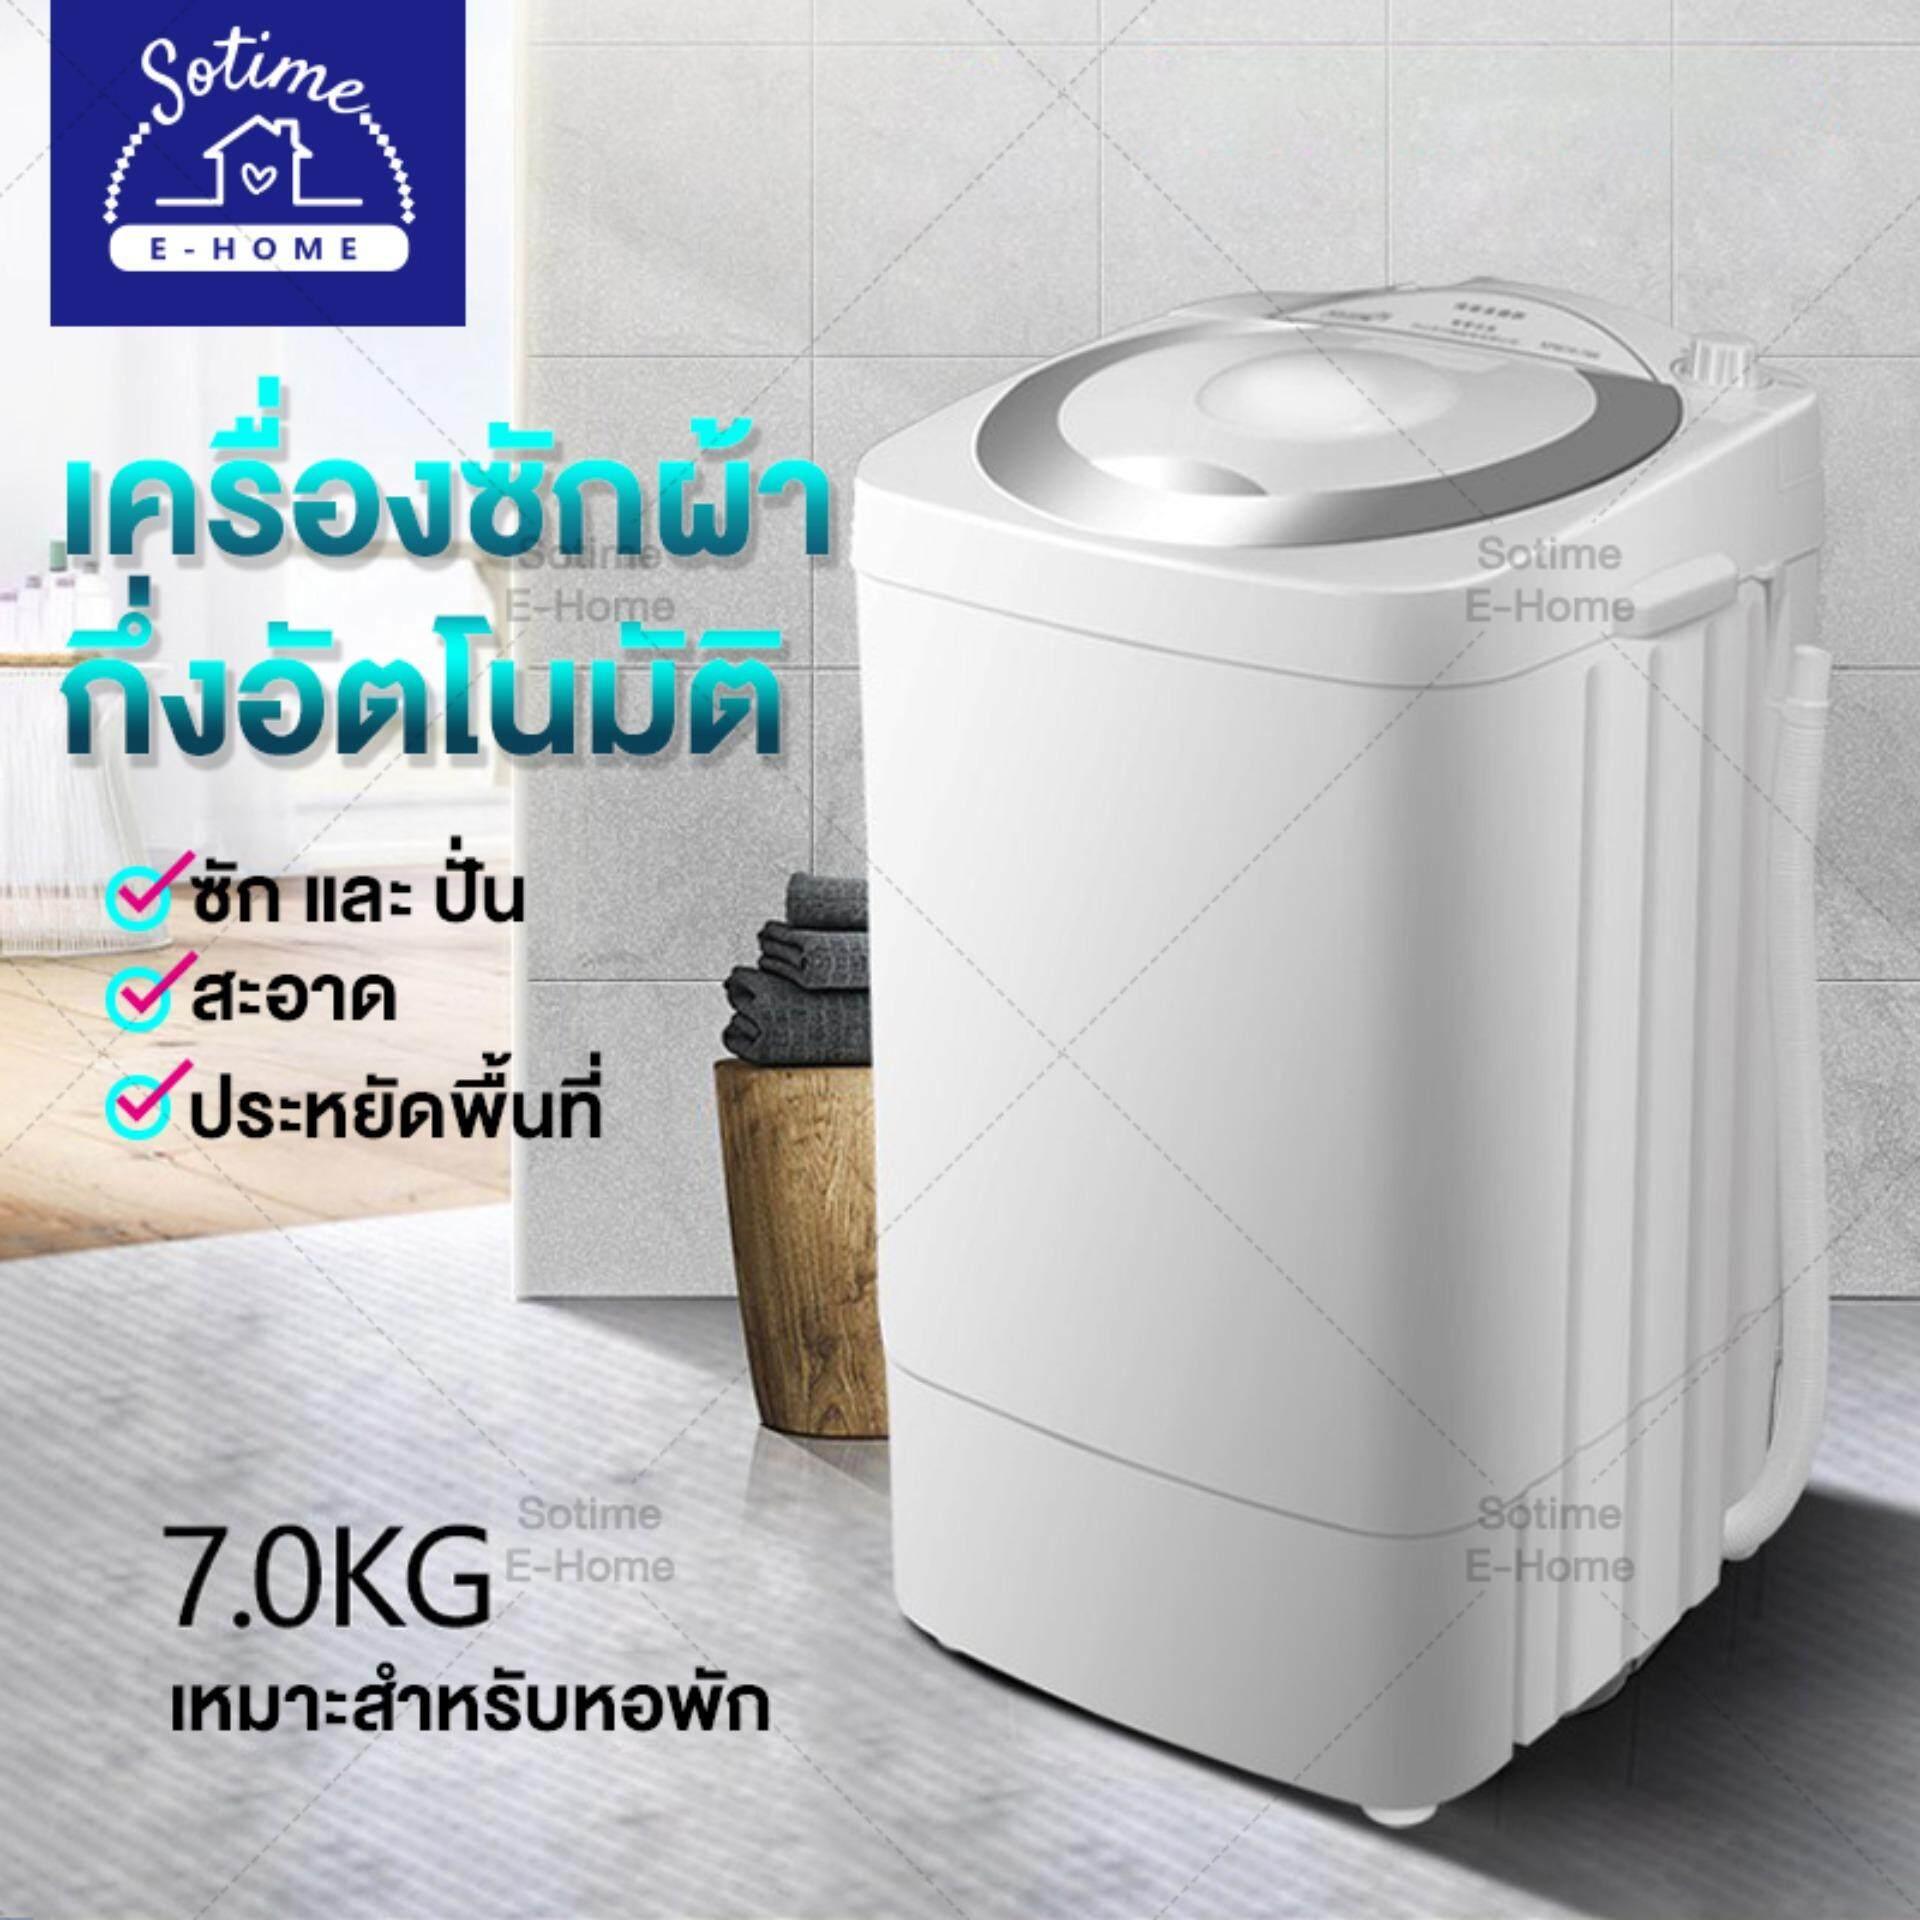 Sotimeเครื่องซักผ้ากึ่งอัตโนมัติ 7.0 Kg แบบถังเดี่ยว (สีขาว) By Sotime E-Home.